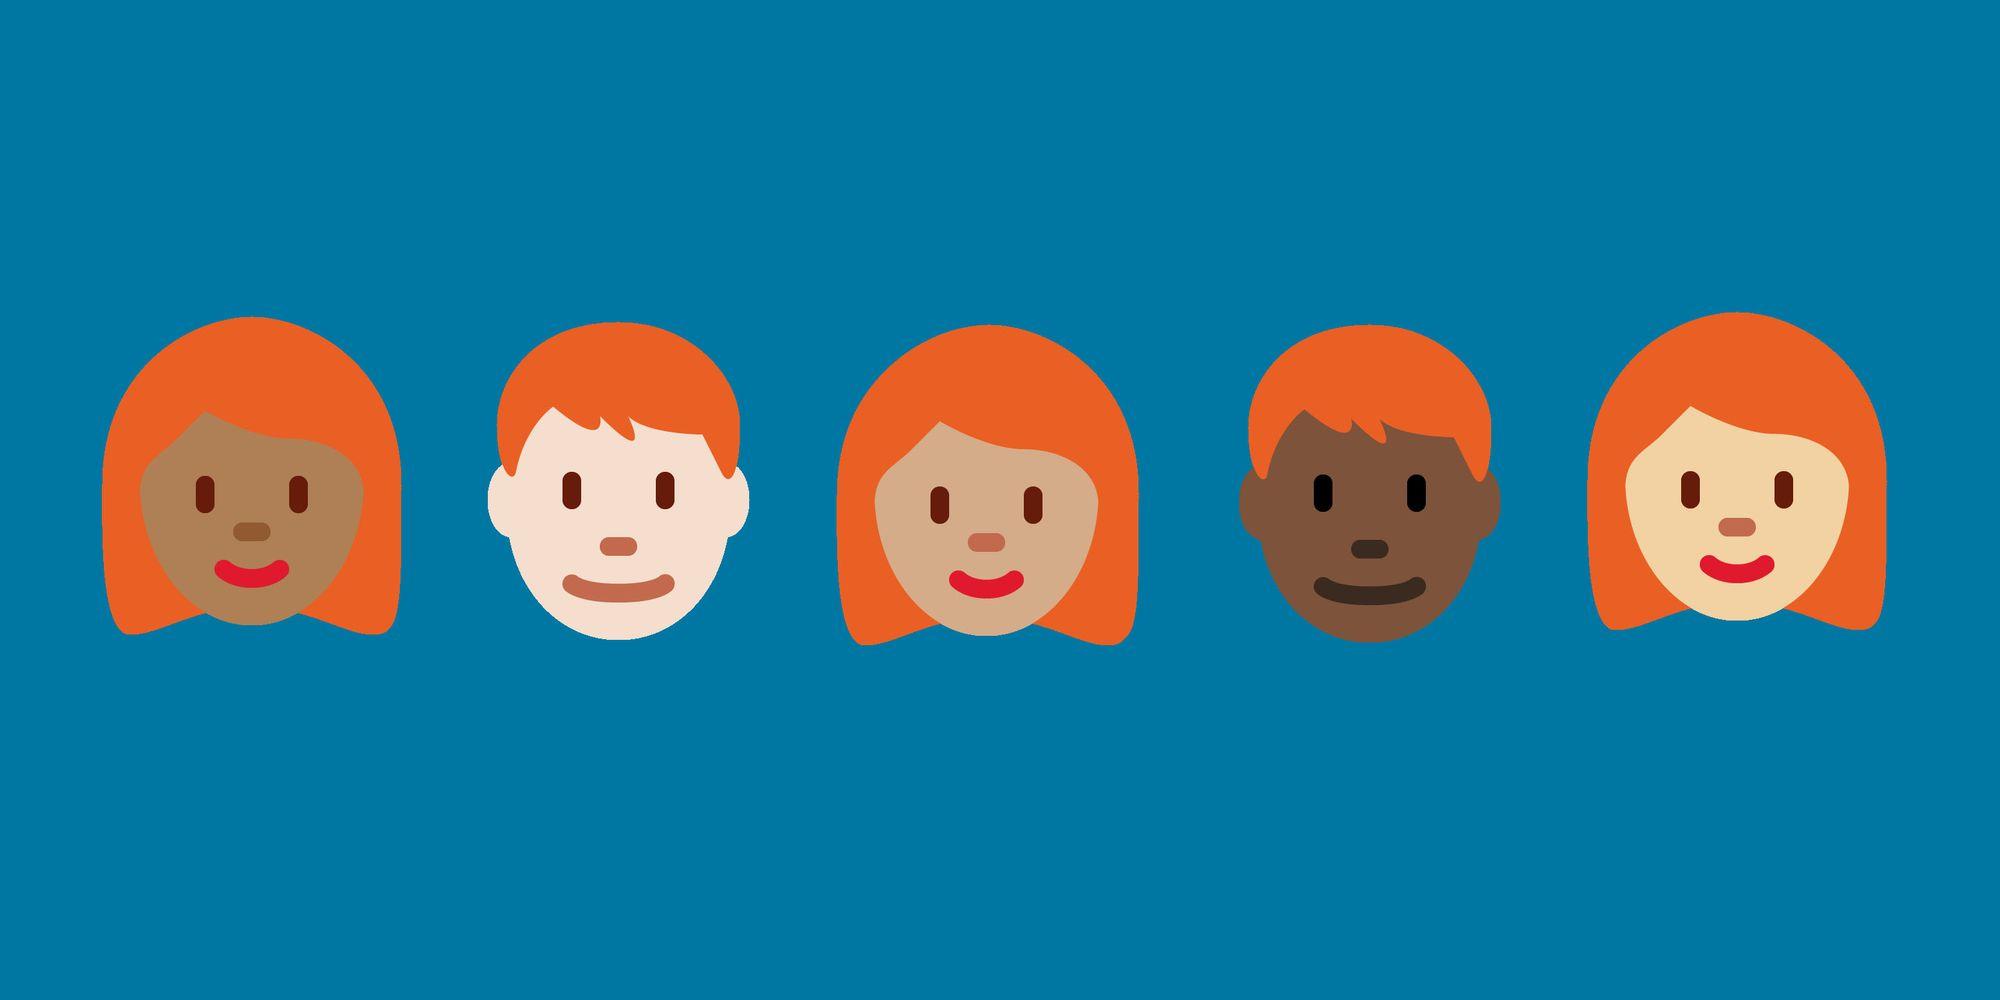 Twemoji 11.0 Emoji Changelog